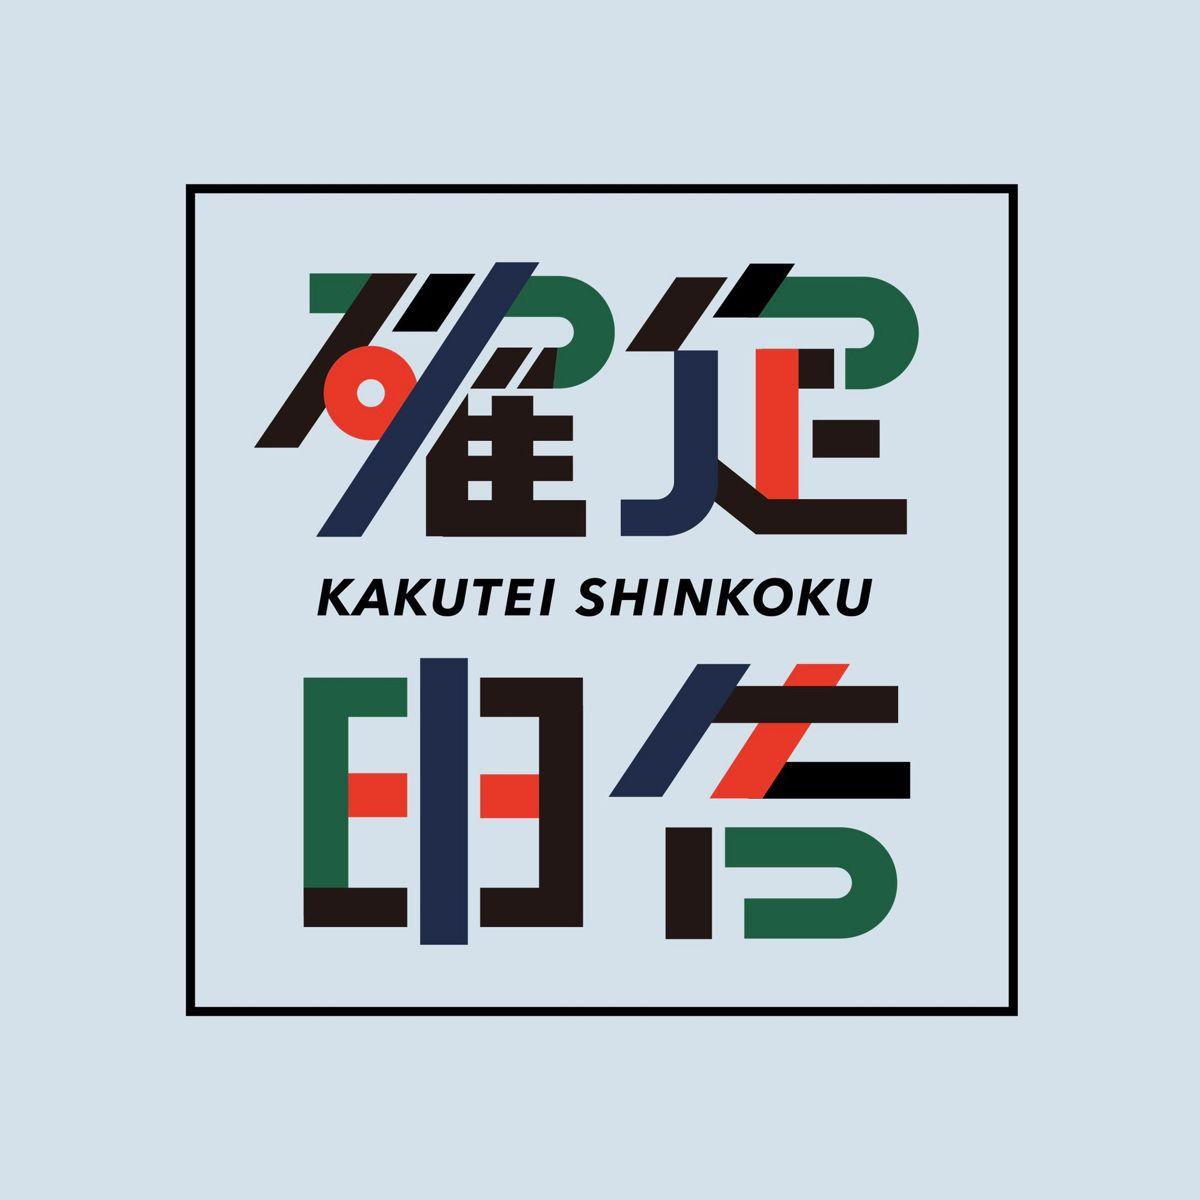 Typography おしゃれまとめの人気アイデア Pinterest 本草 漢字の書体 レタリングデザイン タイポグラフィー